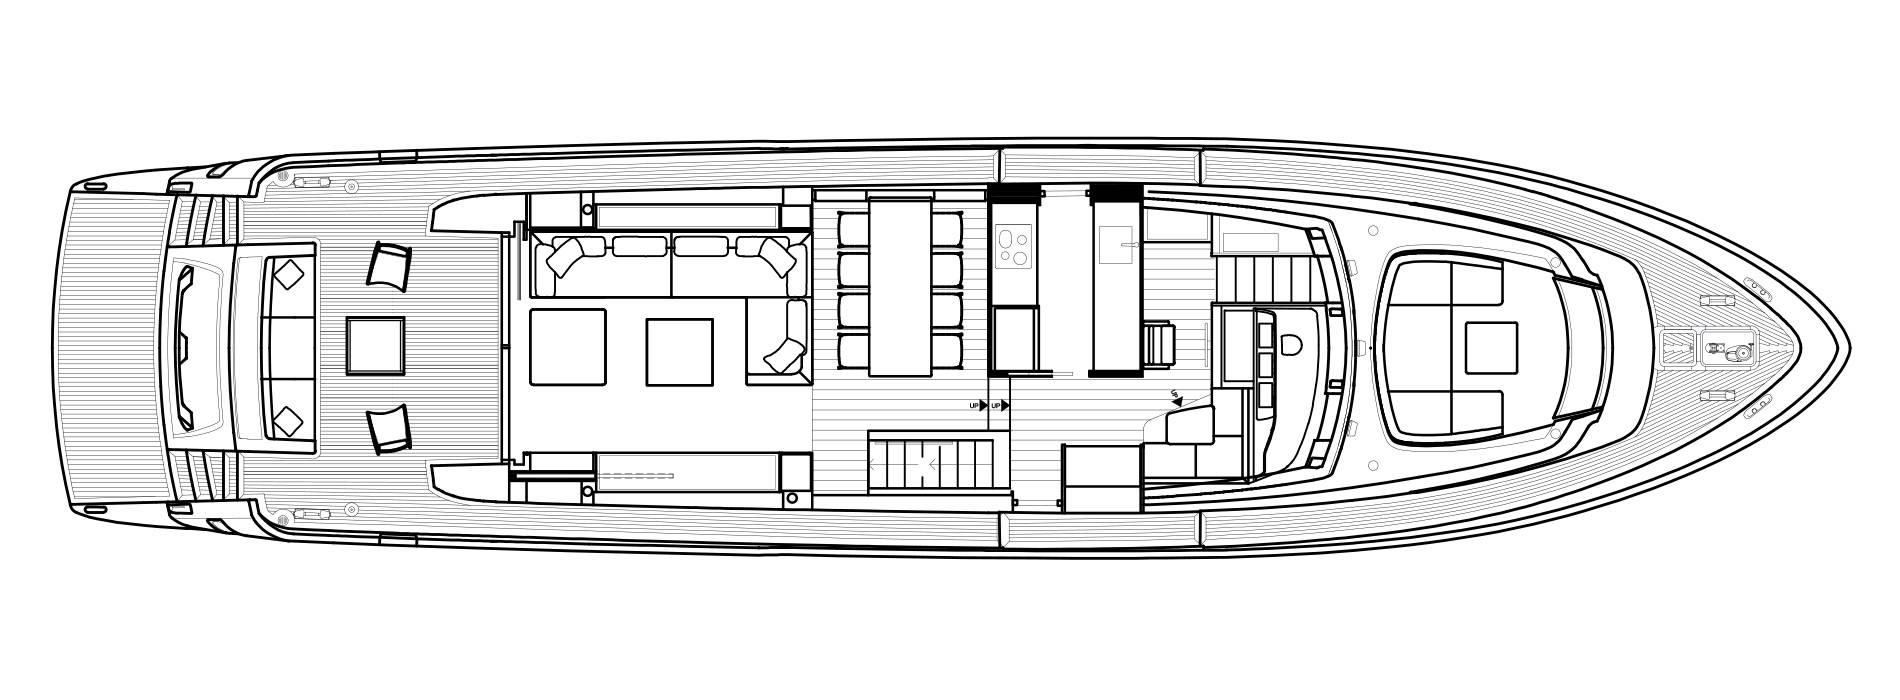 Sanlorenzo Yachts SL78 Hauptdeck